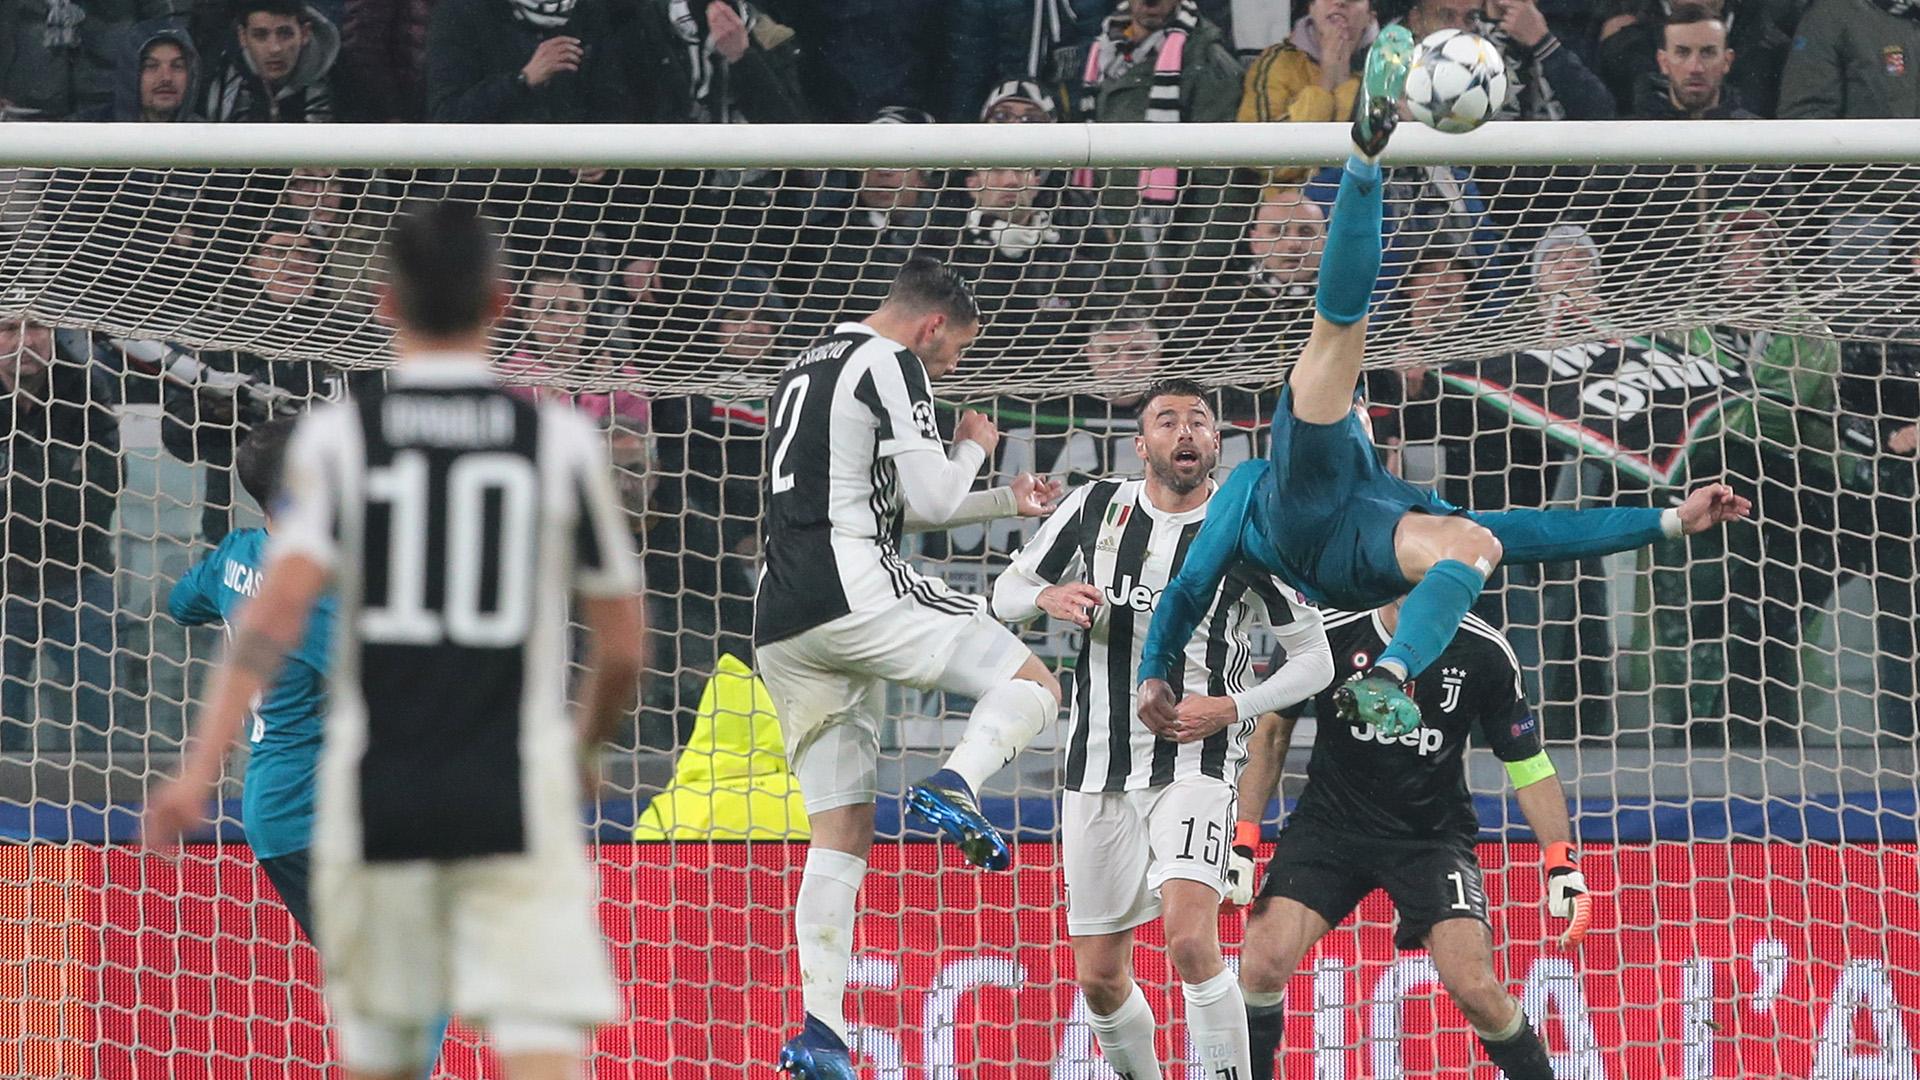 Cristiano Ronaldo Real Madrid Juventus bicycle kick goal Champions League 2017